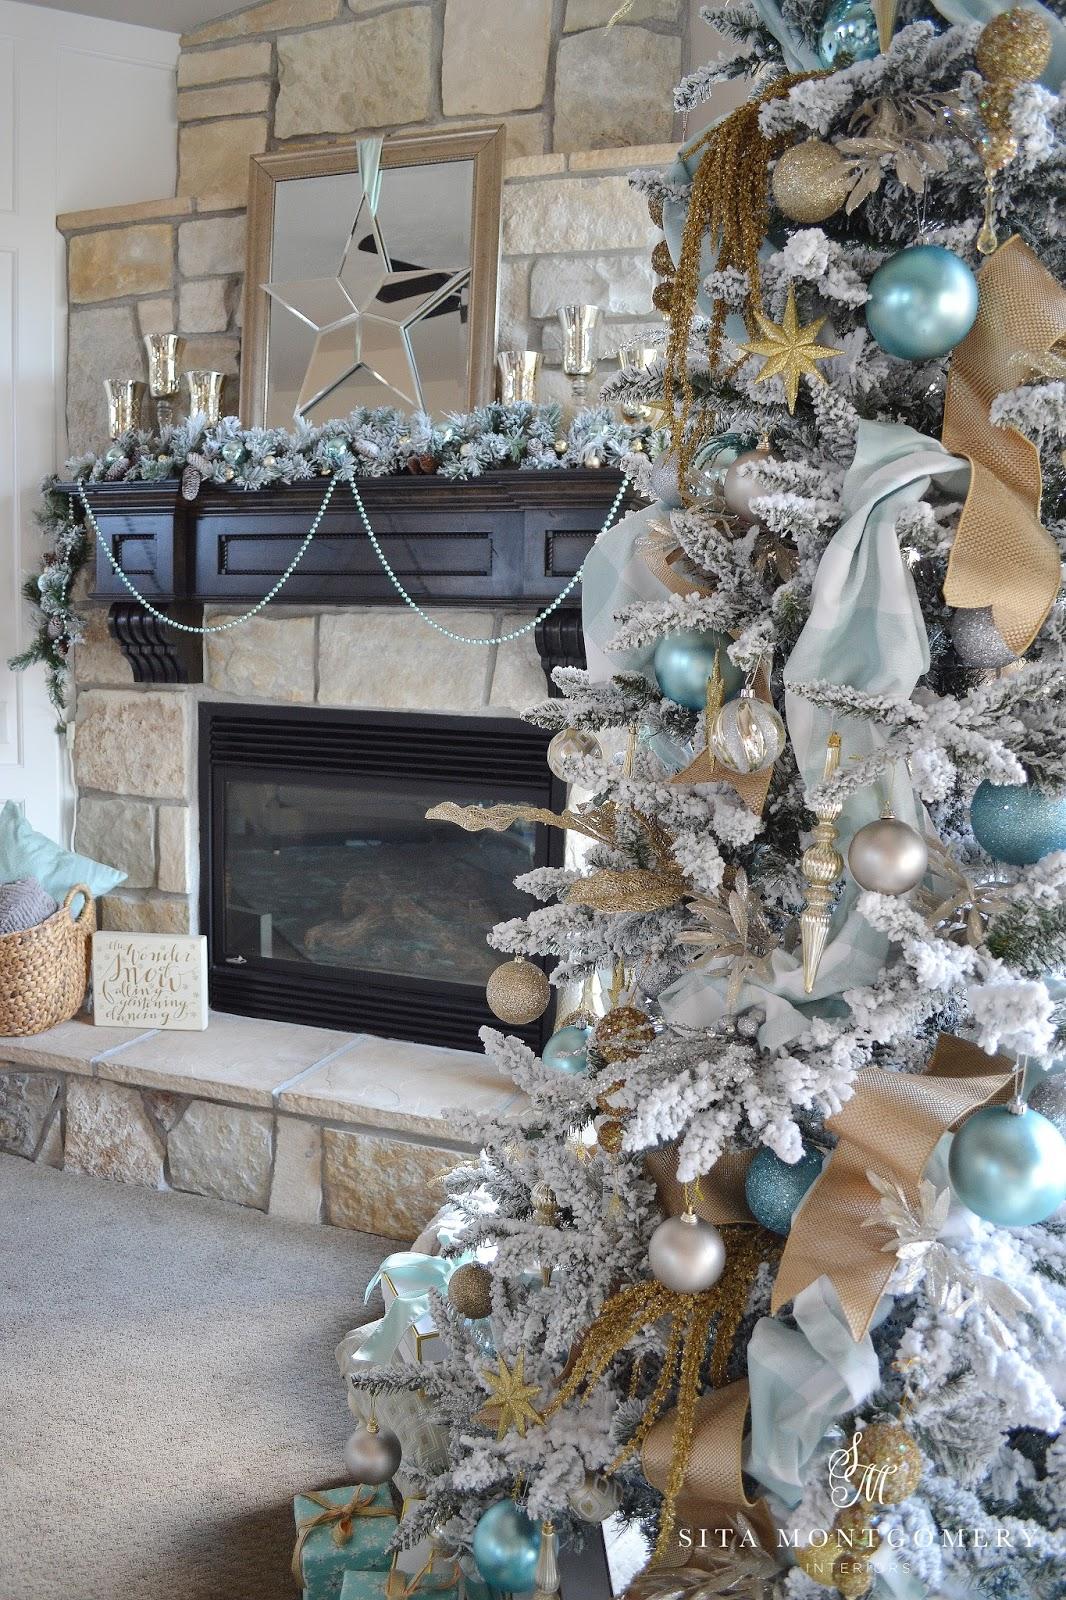 My Holiday Home 2015 - Sita Montgomery Interiors